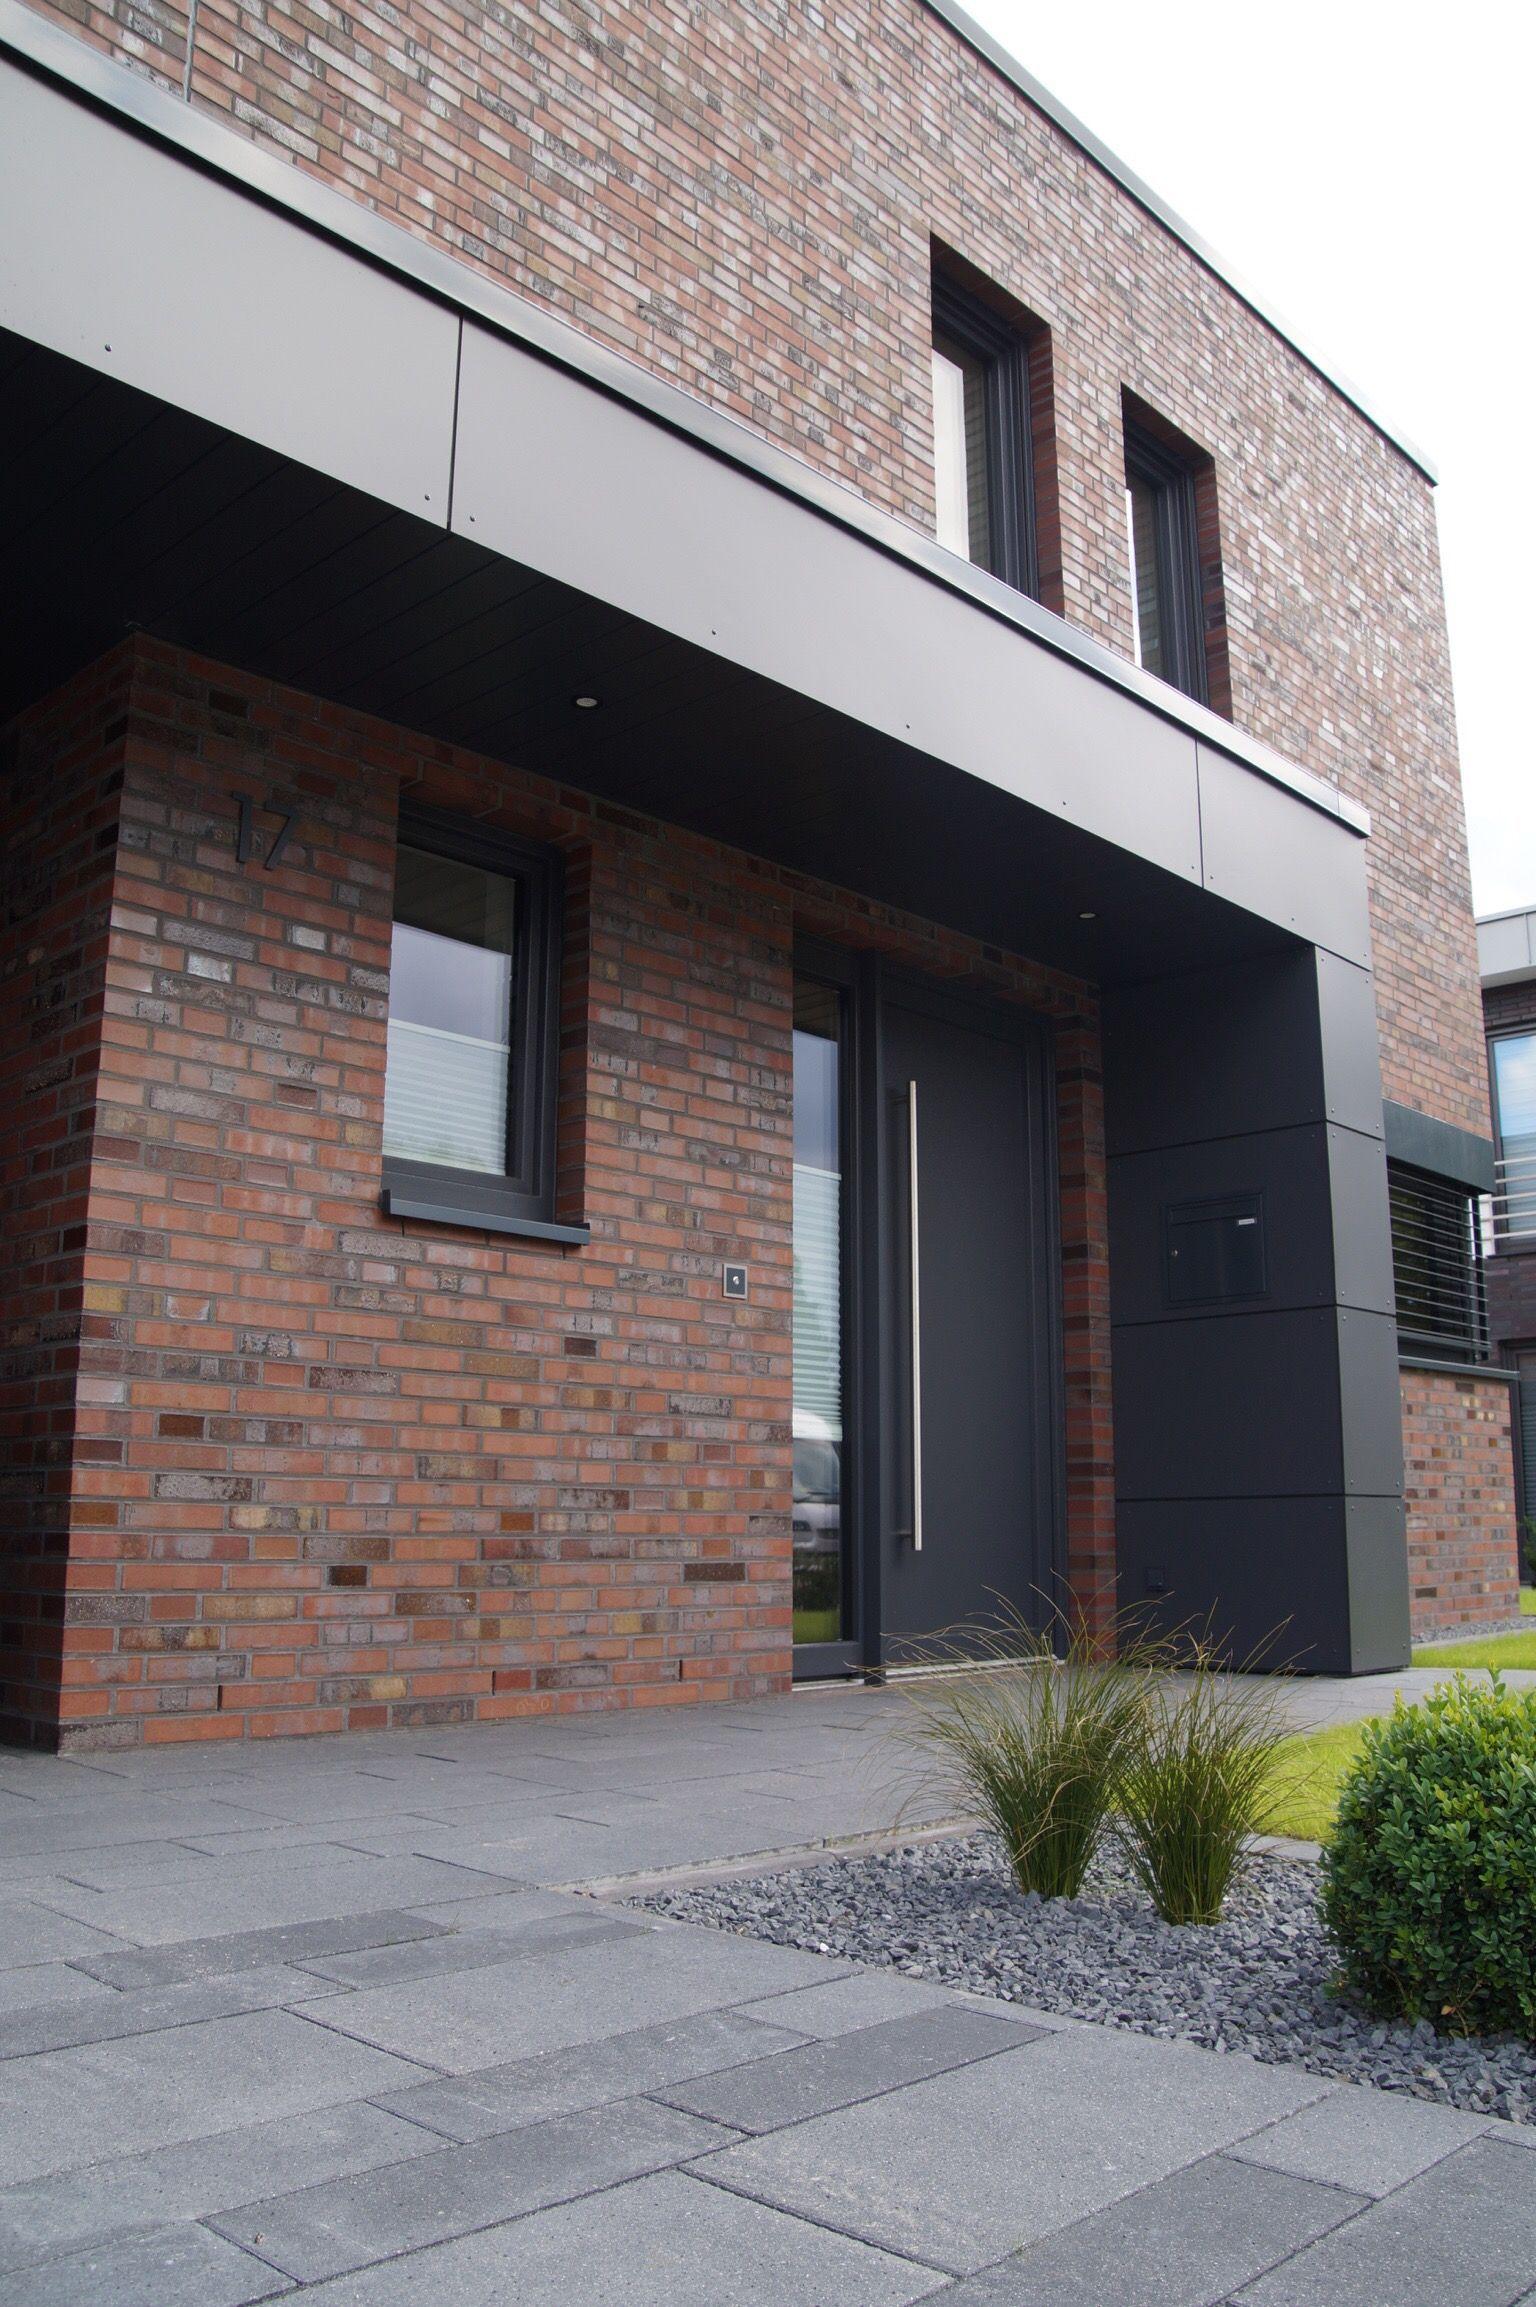 Uberdach Vordach Carport Hauseingang Haustur Vordach Eingangsbereich In 2020 Vordach Hauseingang Hauseingang Uberdachung Hauseingang